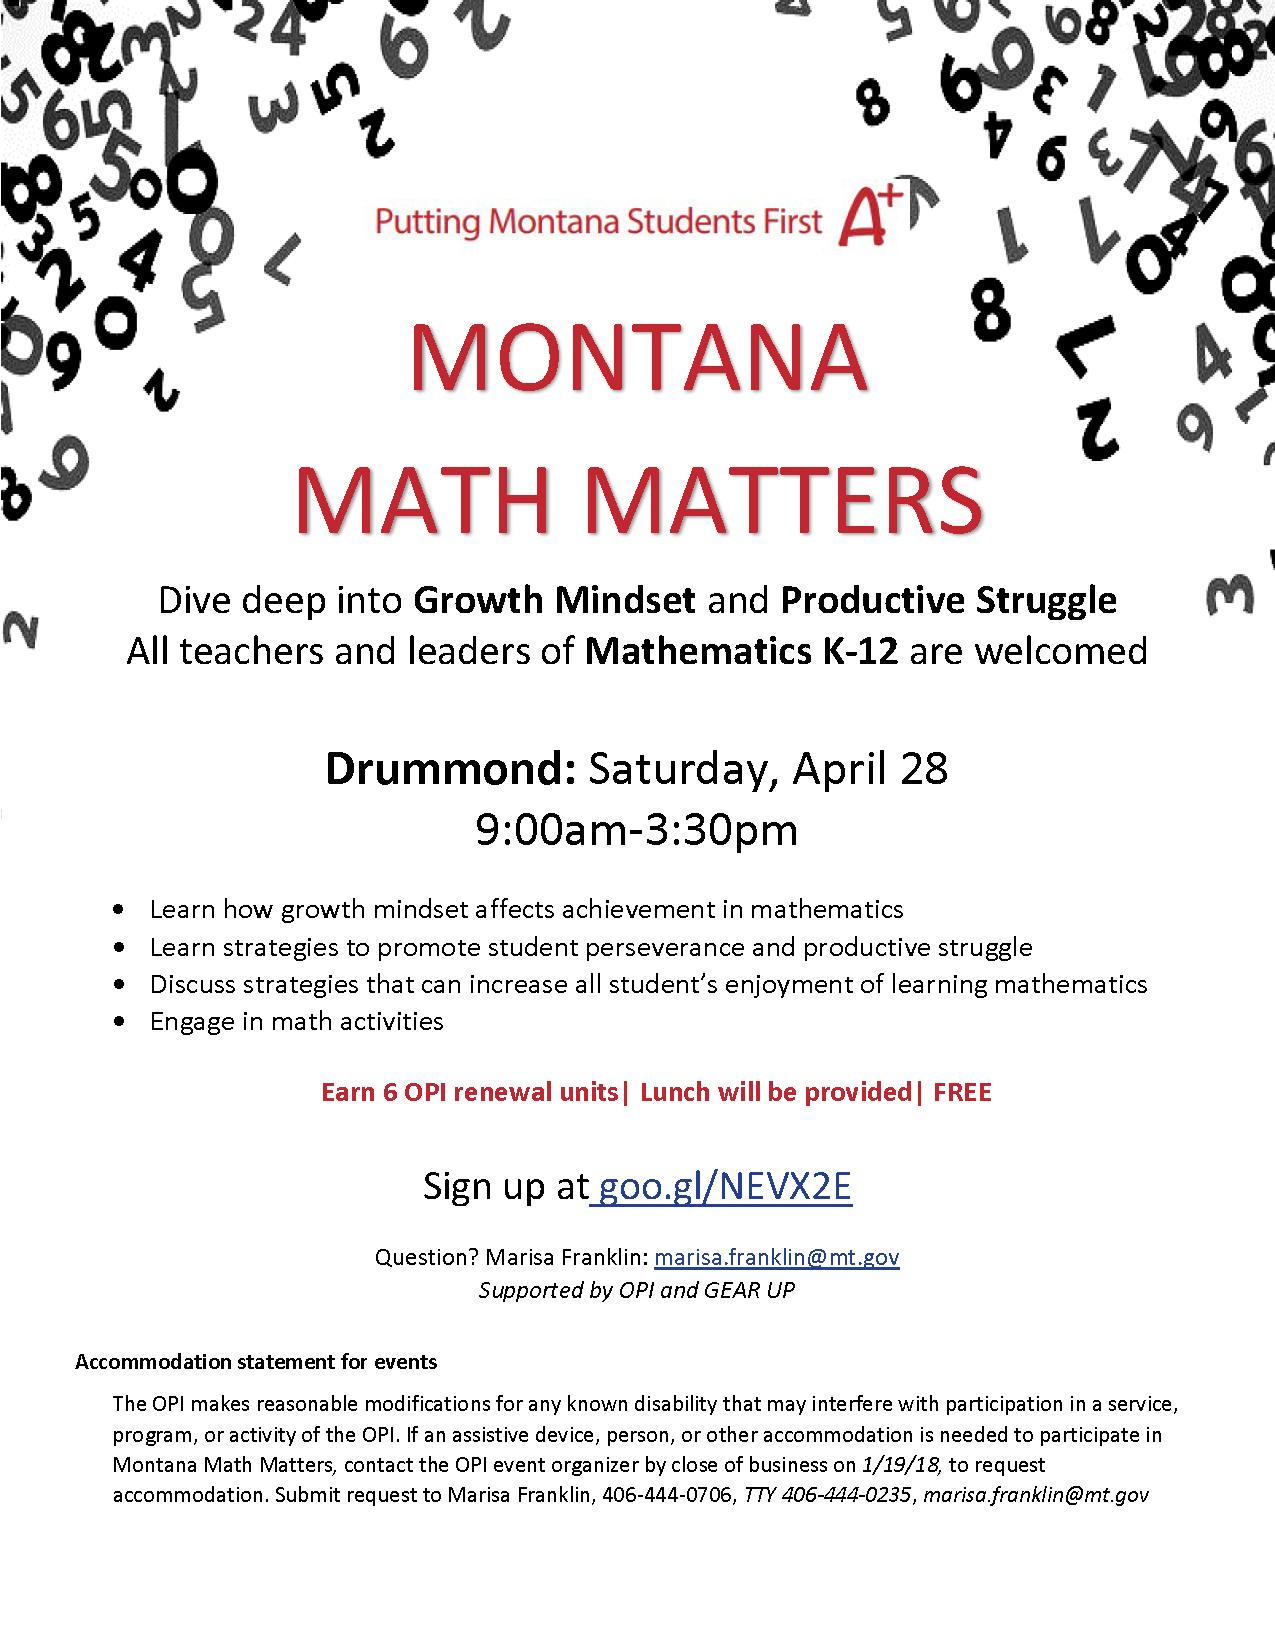 Montana Math Matters Growth Mindset And Productive Struggle